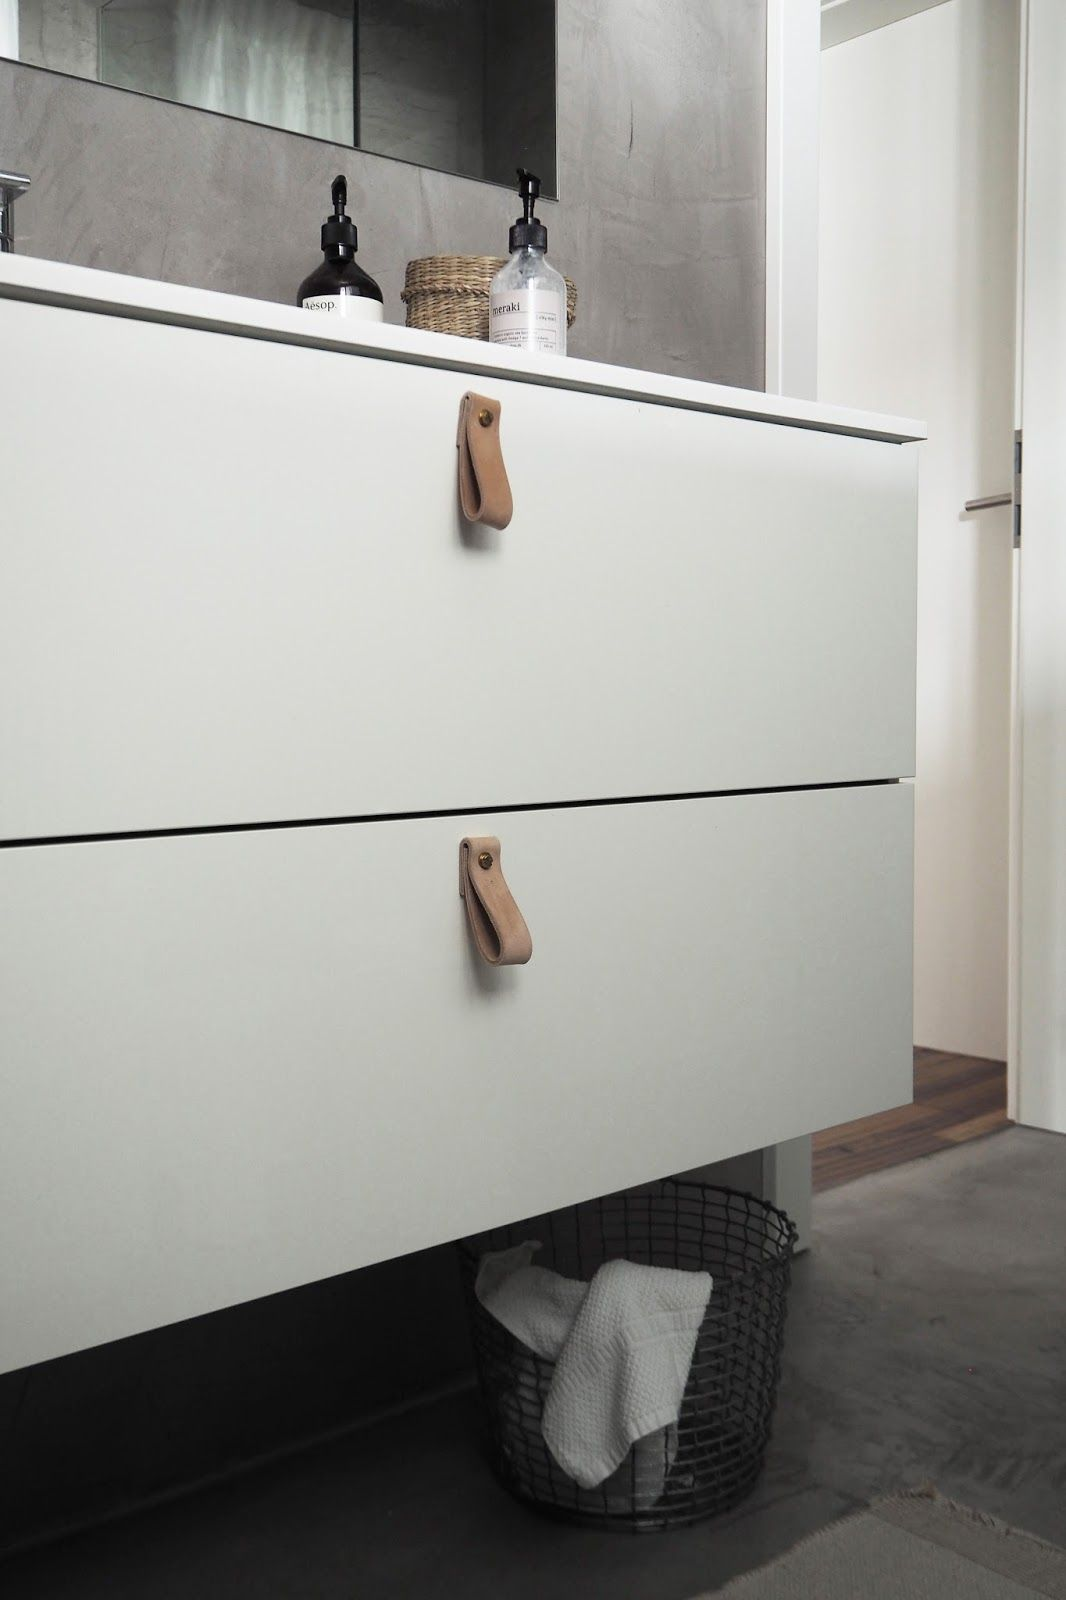 Ikea-Hack im Badezimmer | Diy